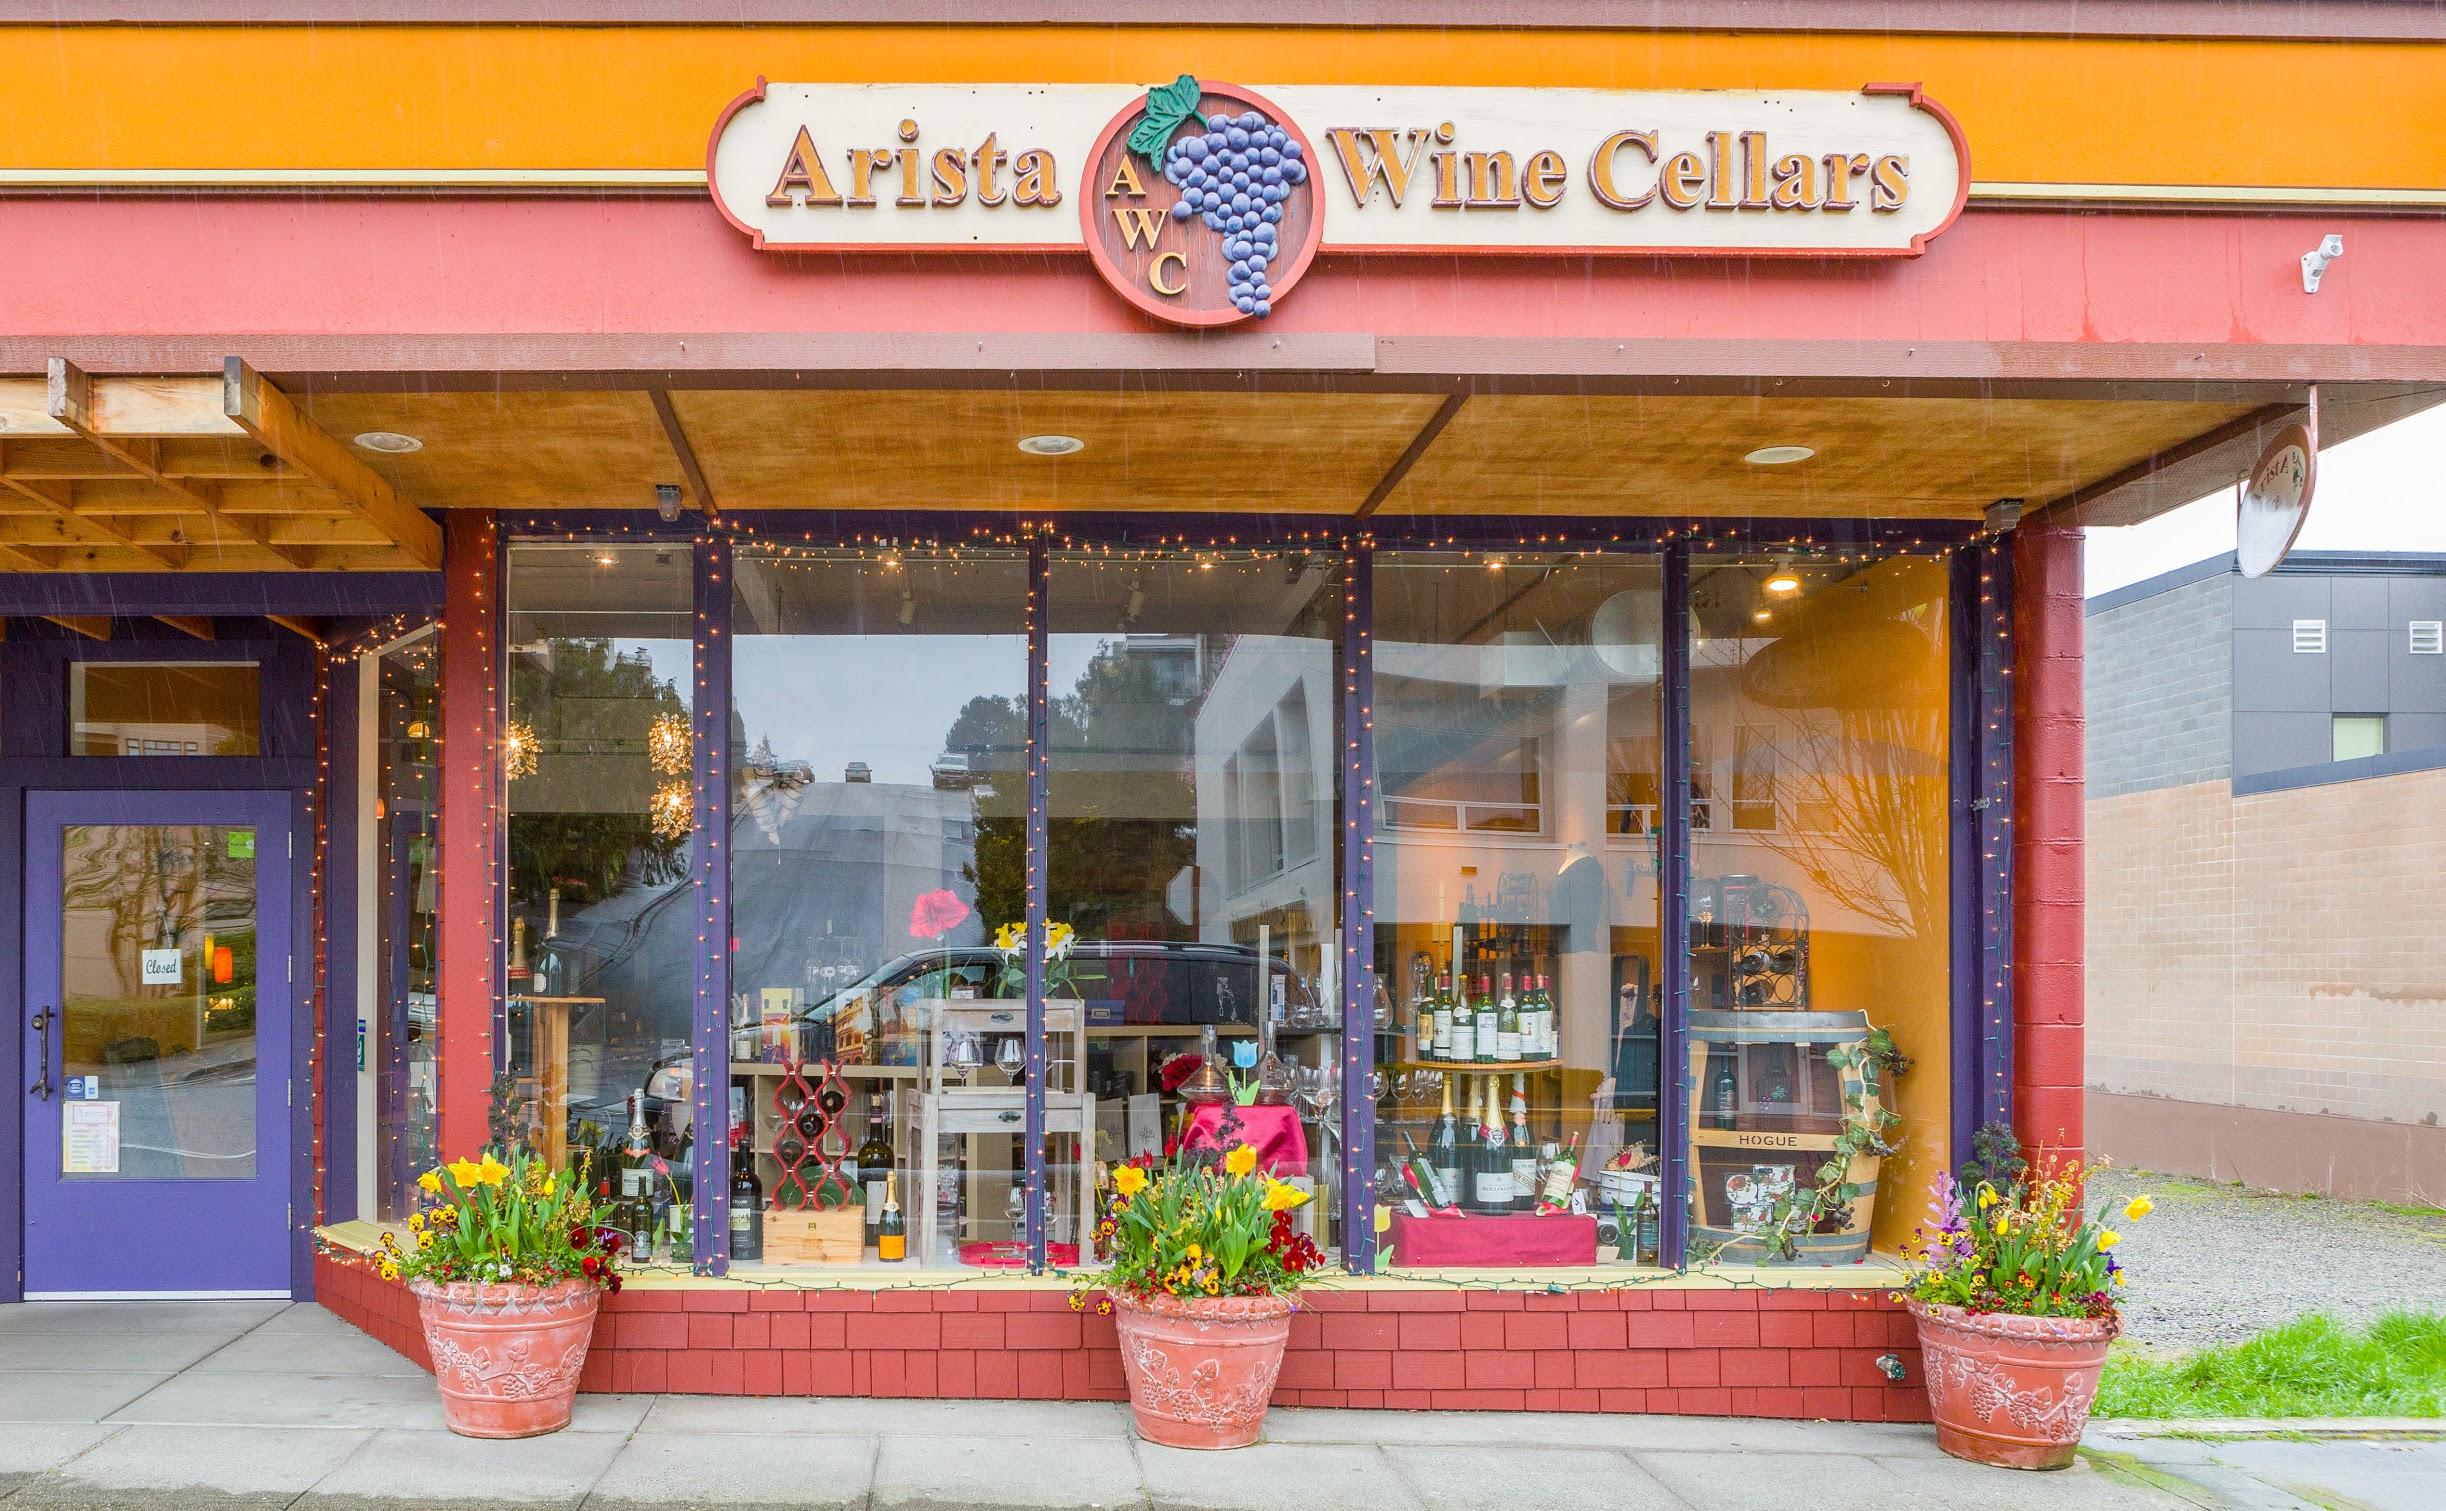 Arista Wine Cellars